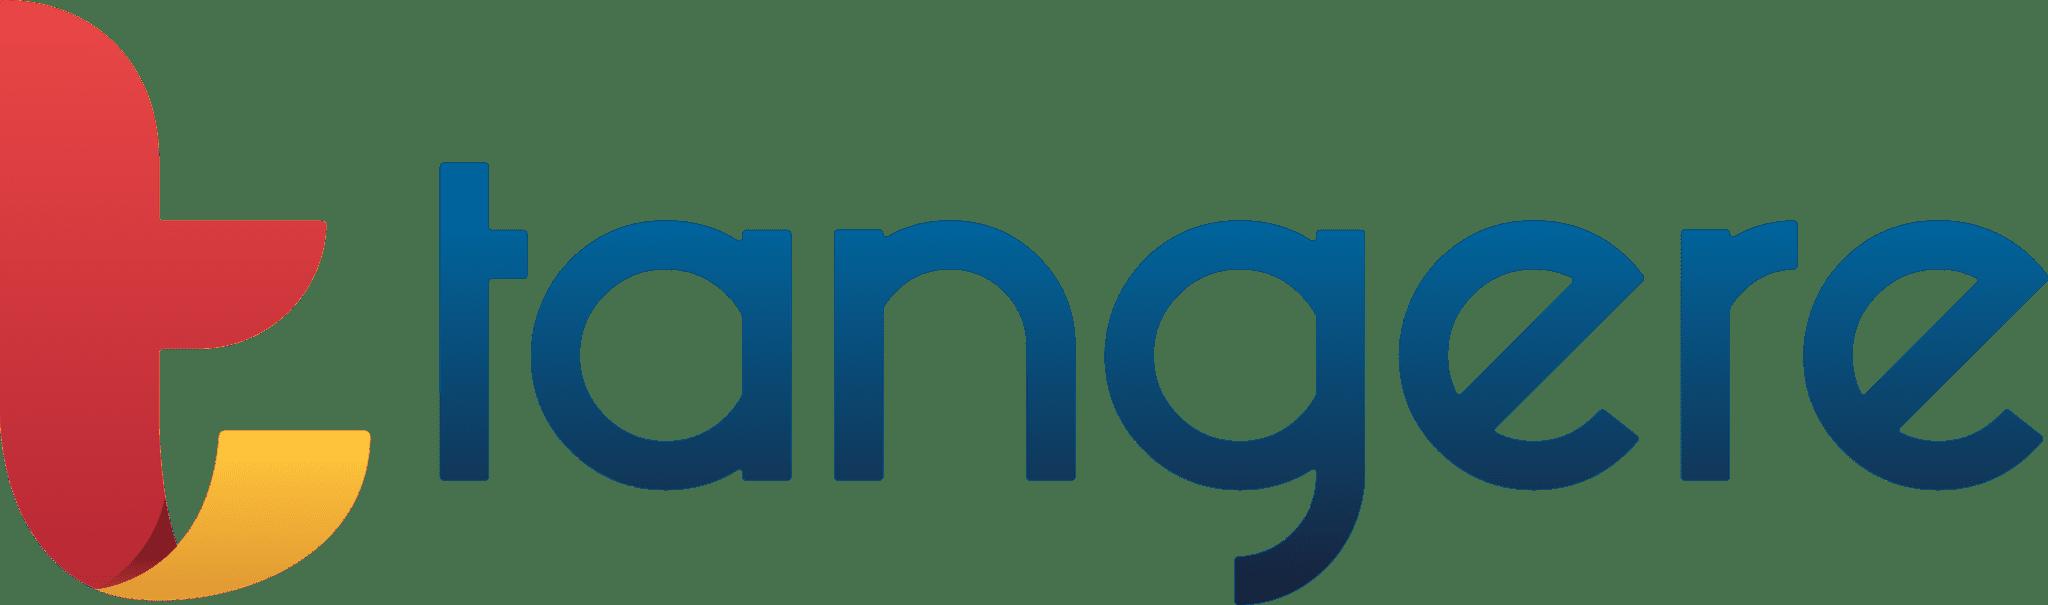 Filipino - Founded Startups: Big Data Analytics & Travel